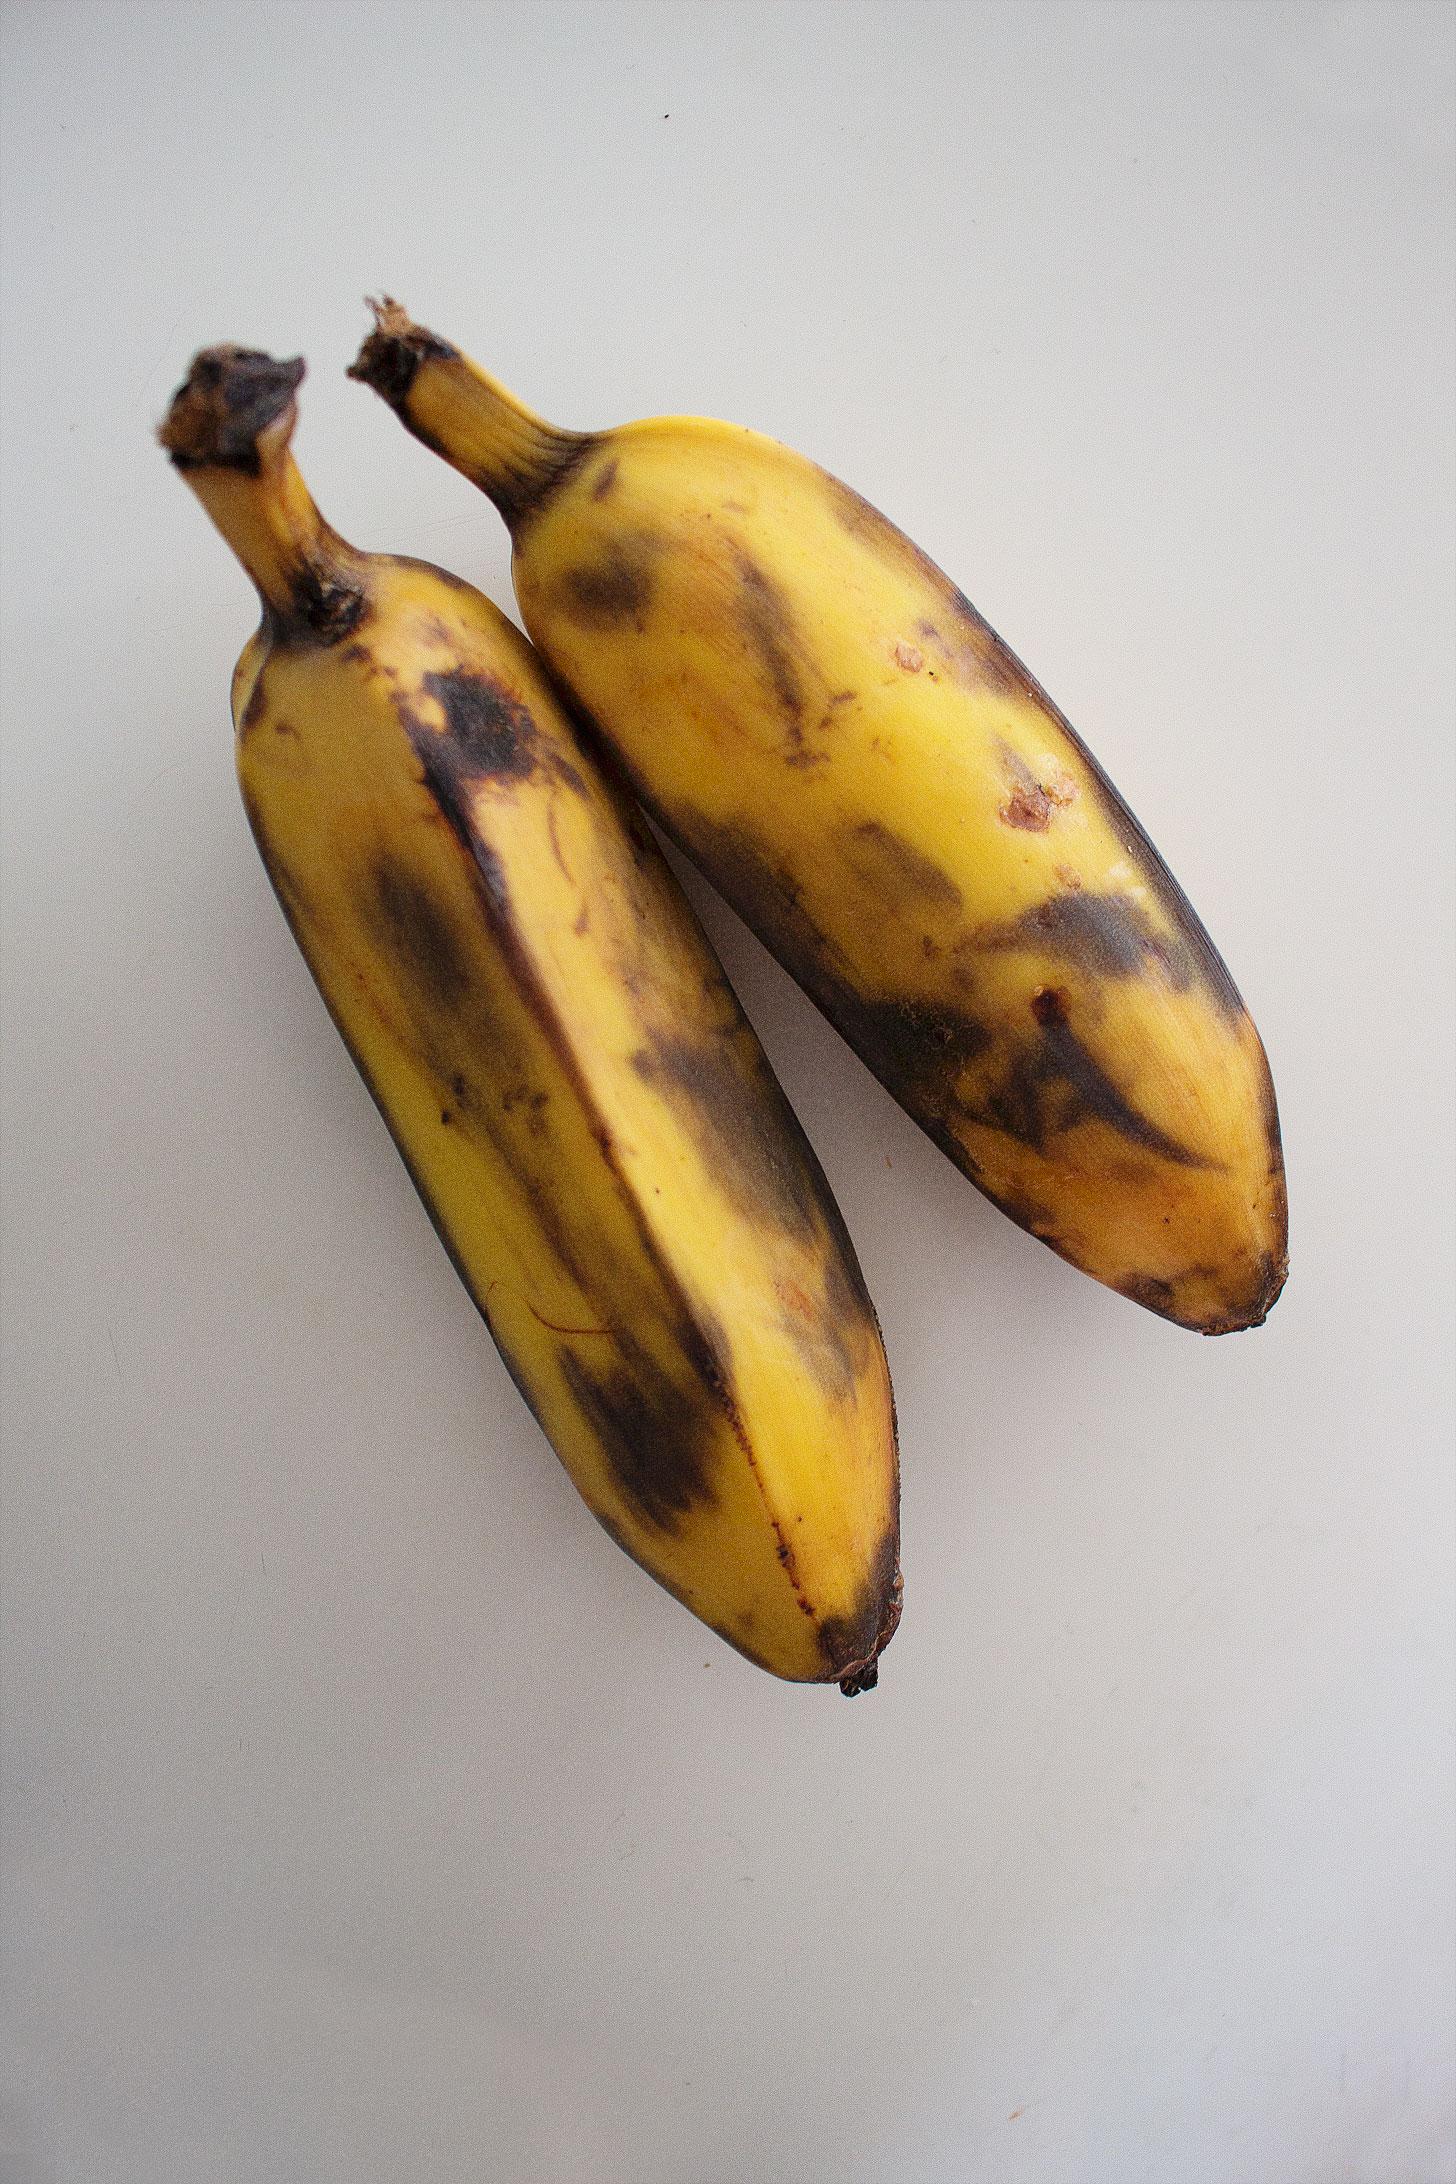 saba-bananas-astigvegan